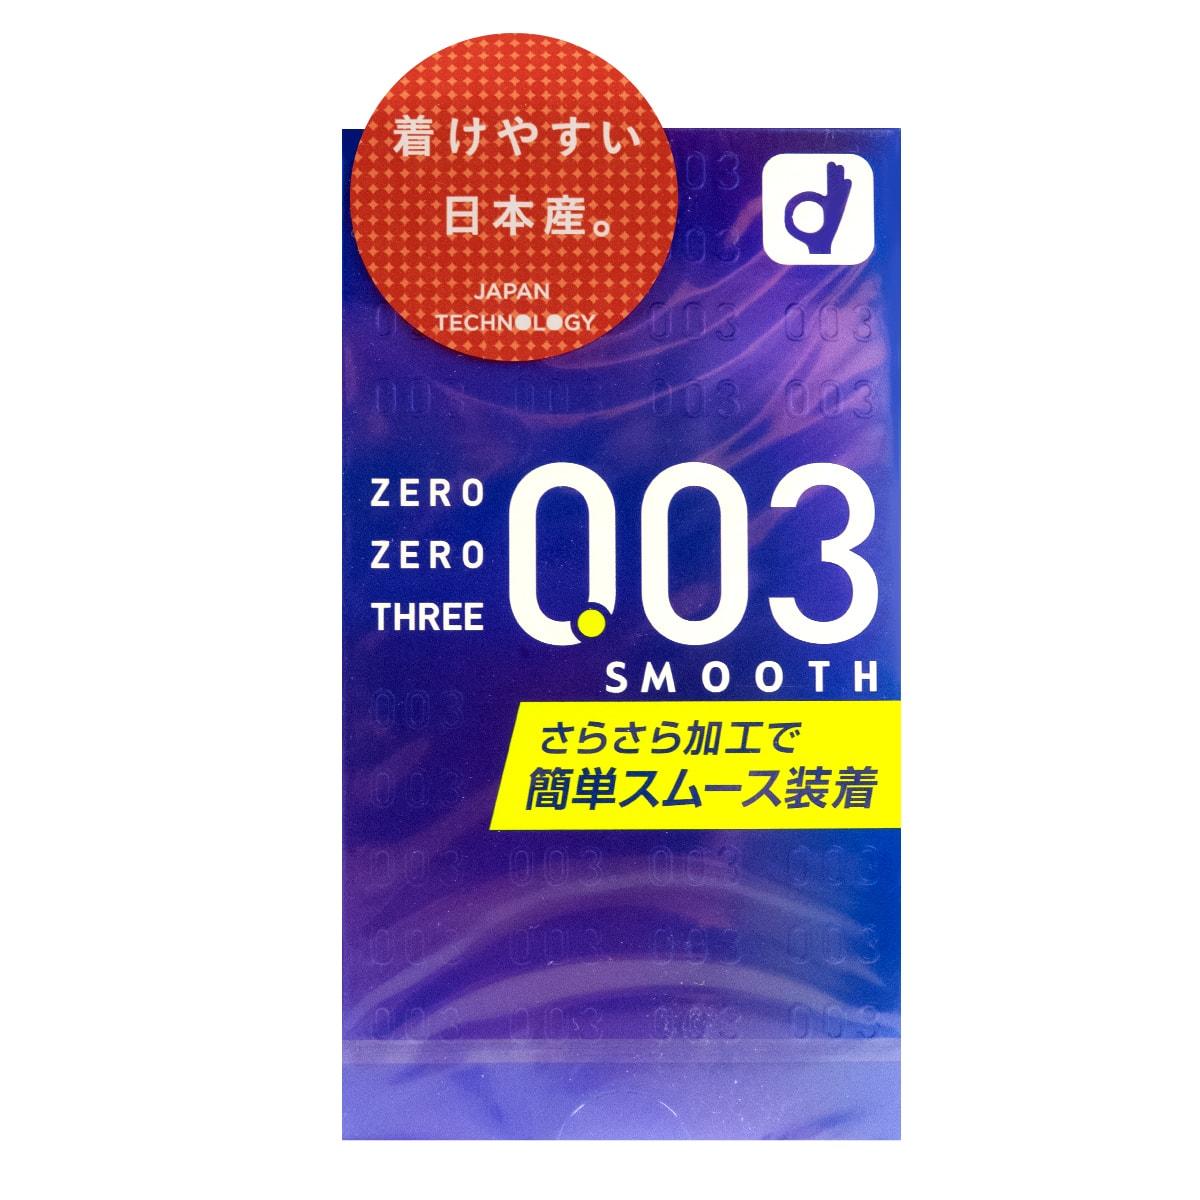 OKAMOTO 0.03 Smooth Lubricated Condoms Ultra Thin 10pc